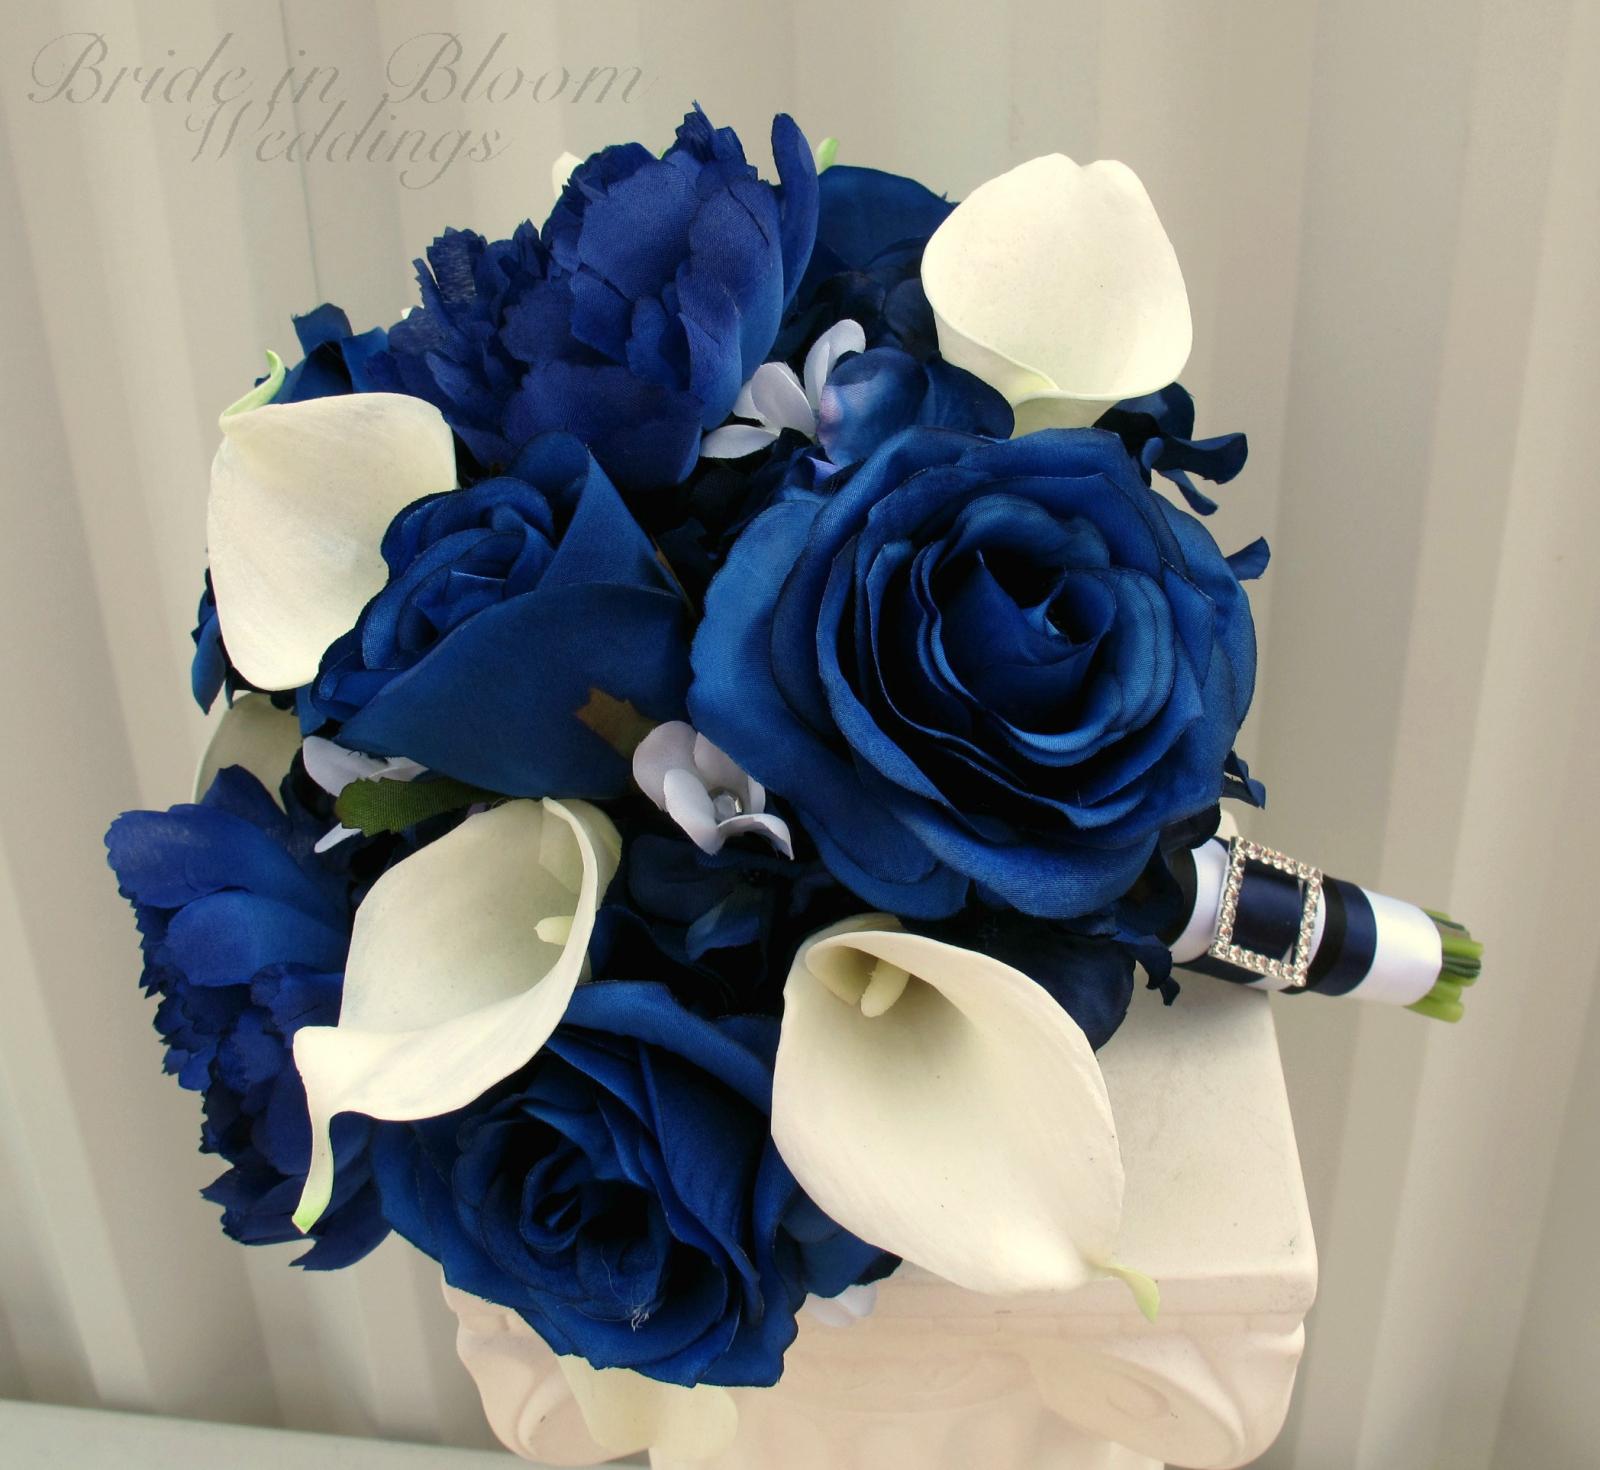 Blue rose calla lily wedding bouquet bride in bloom blue rose calla lily wedding bouquet izmirmasajfo